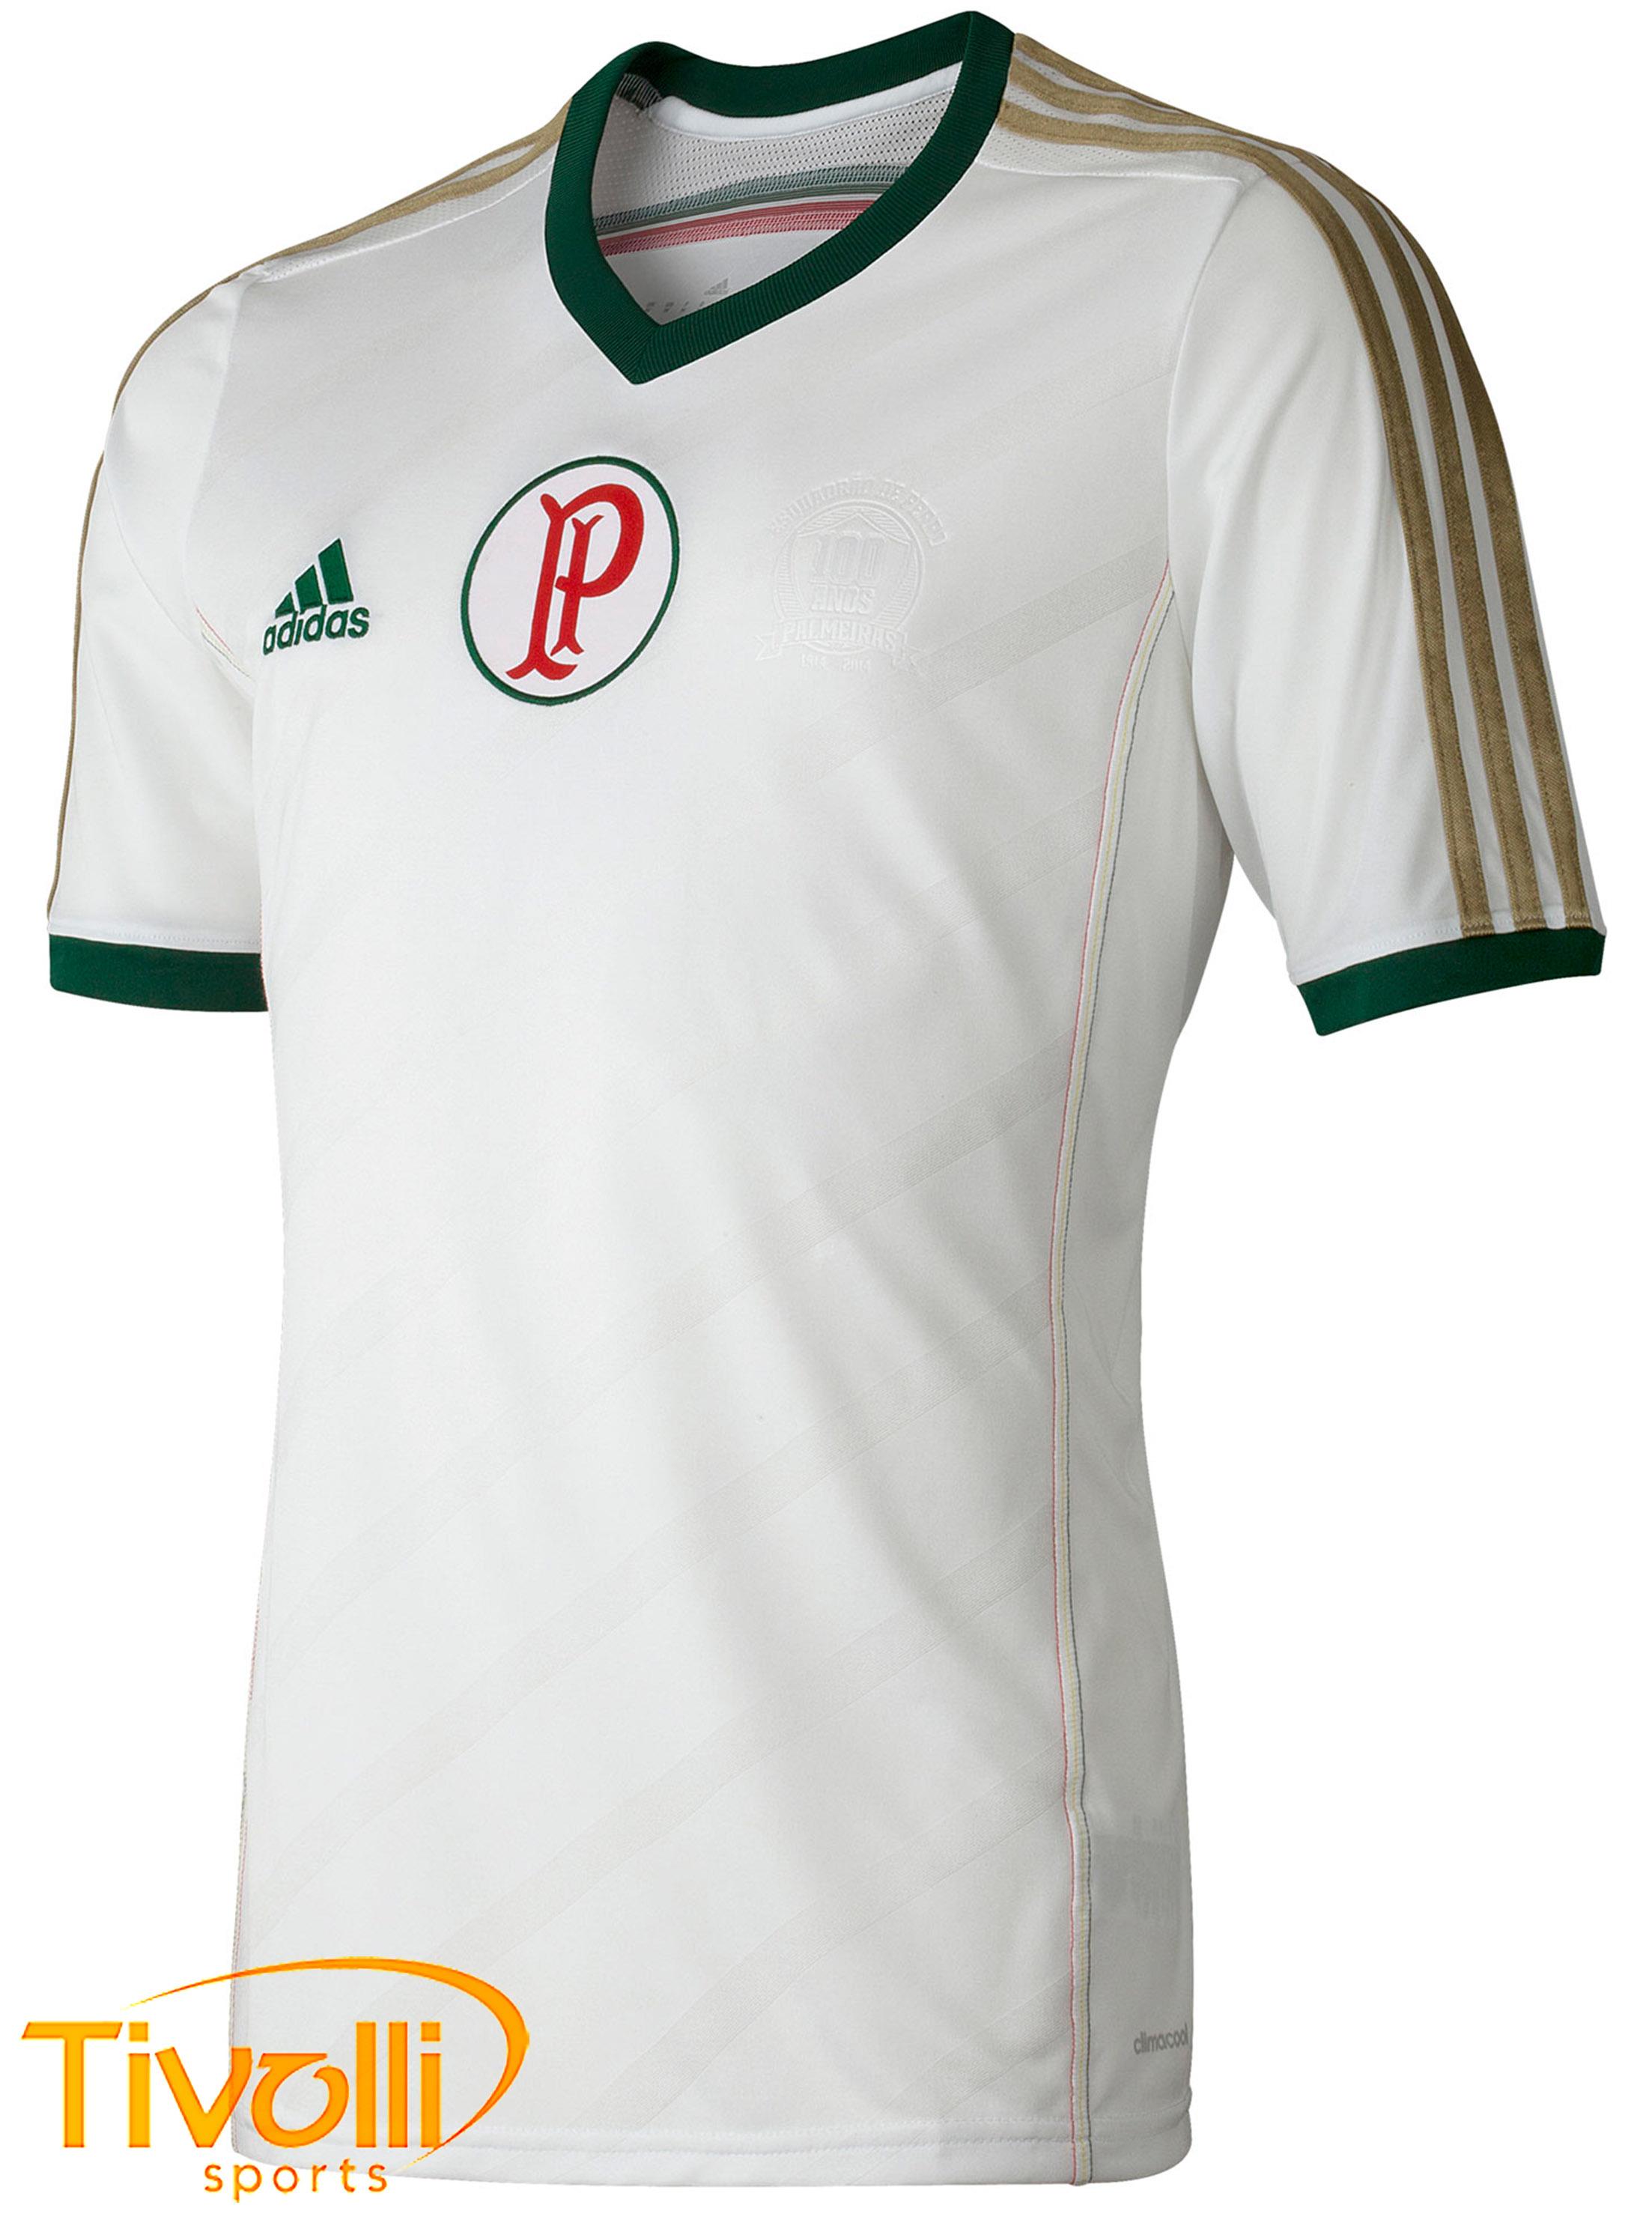 54364f6d49 Camisa Palmeiras ll Away 2014 Infantil Adidas   Branca